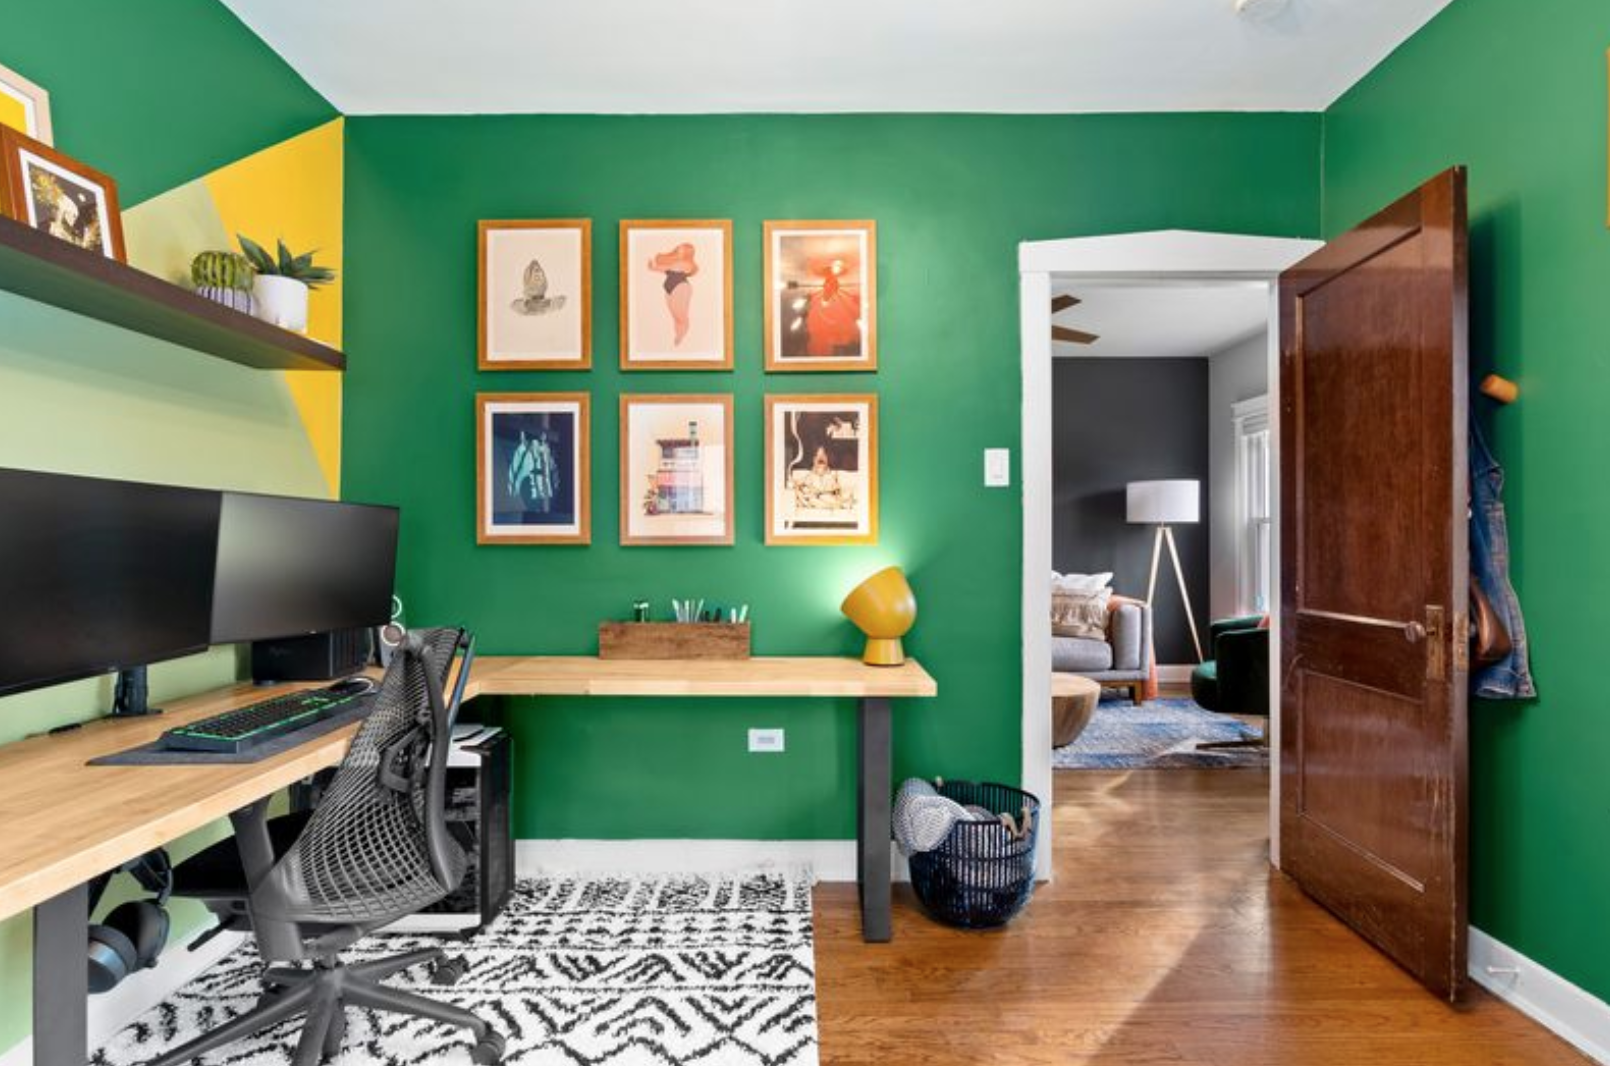 Framed prints in home office